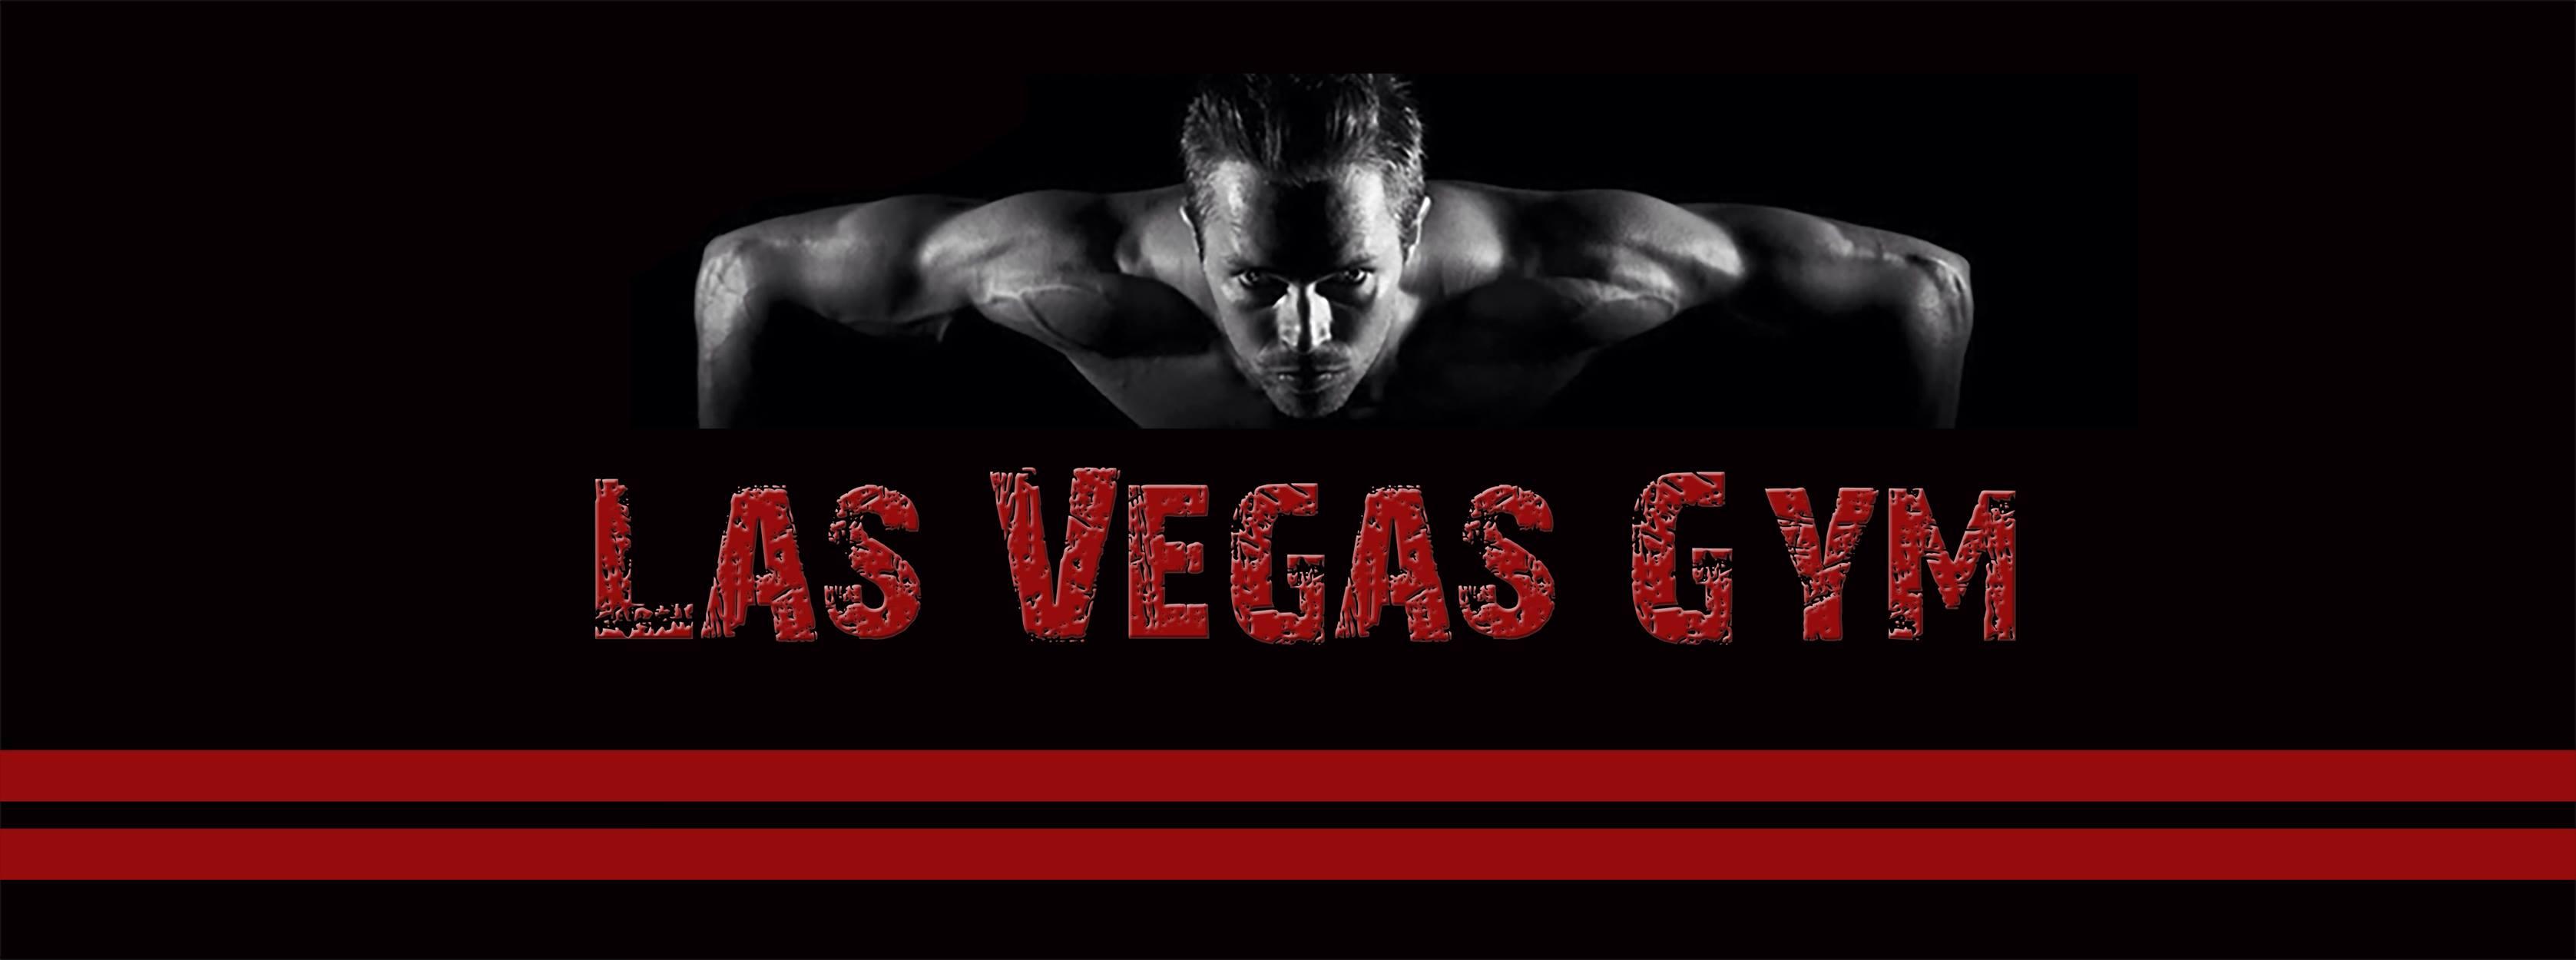 Super Las Vegas Gym